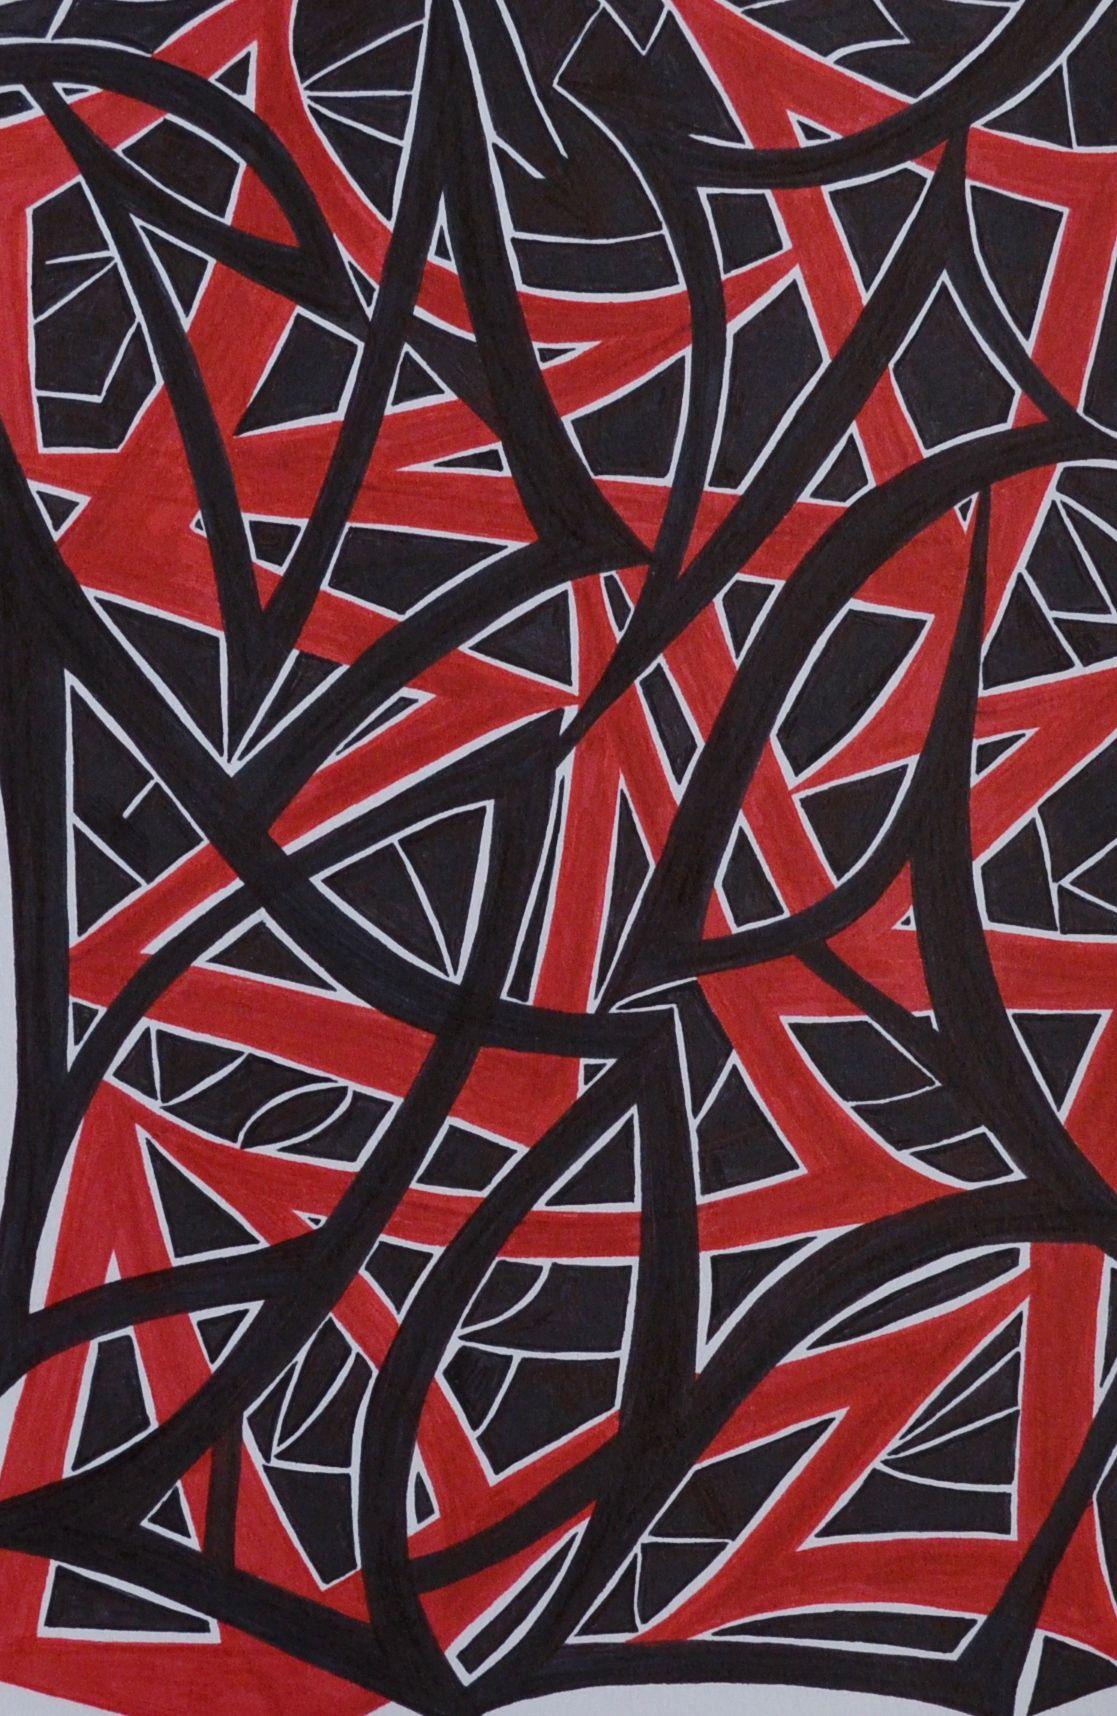 Black and red abstract sharpie art sf sharpie art art